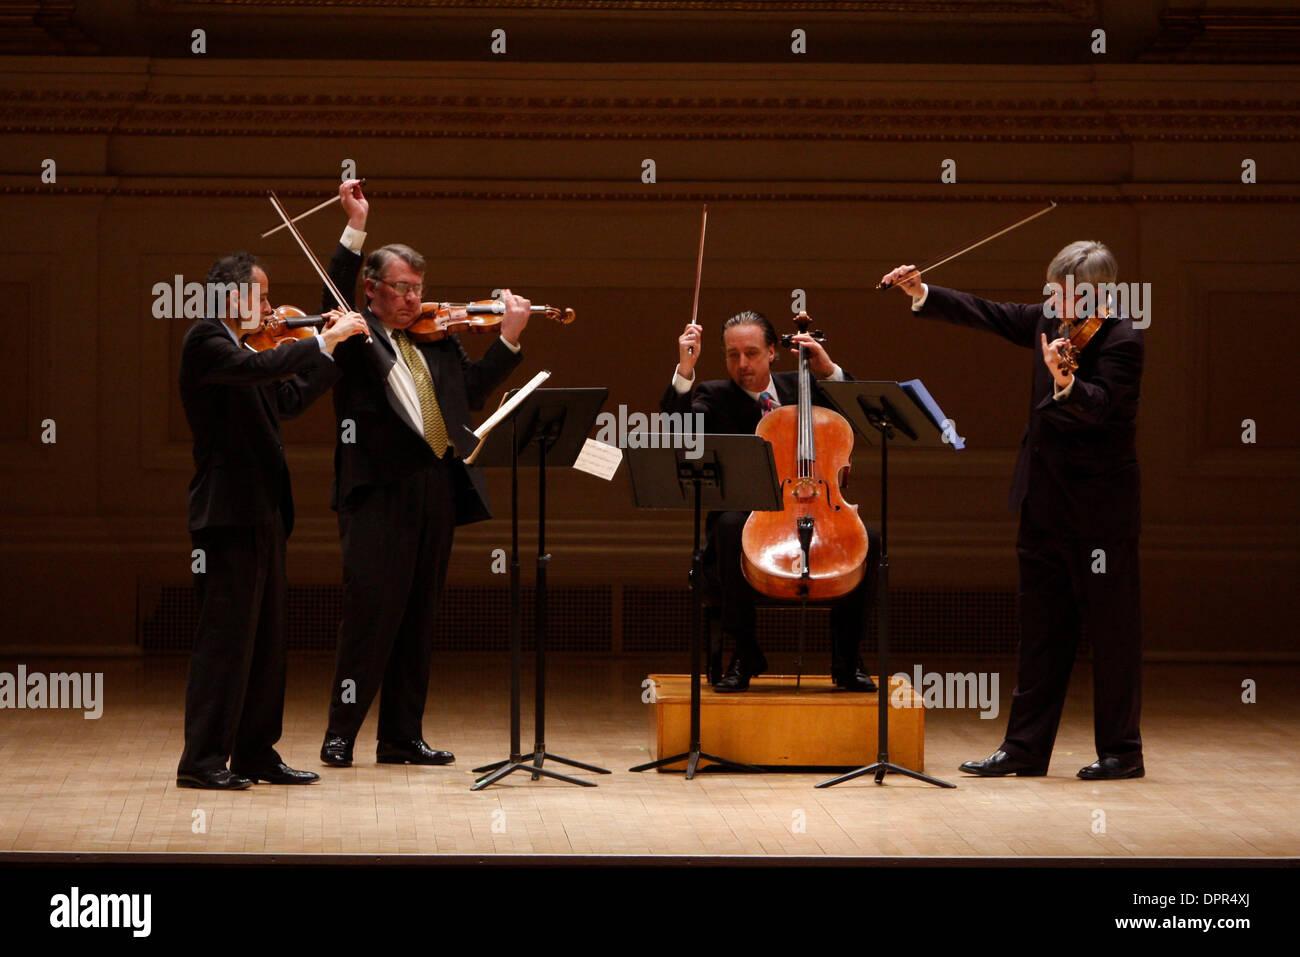 Feb 08, 2009 - New York, NY, USA - The Emerson String